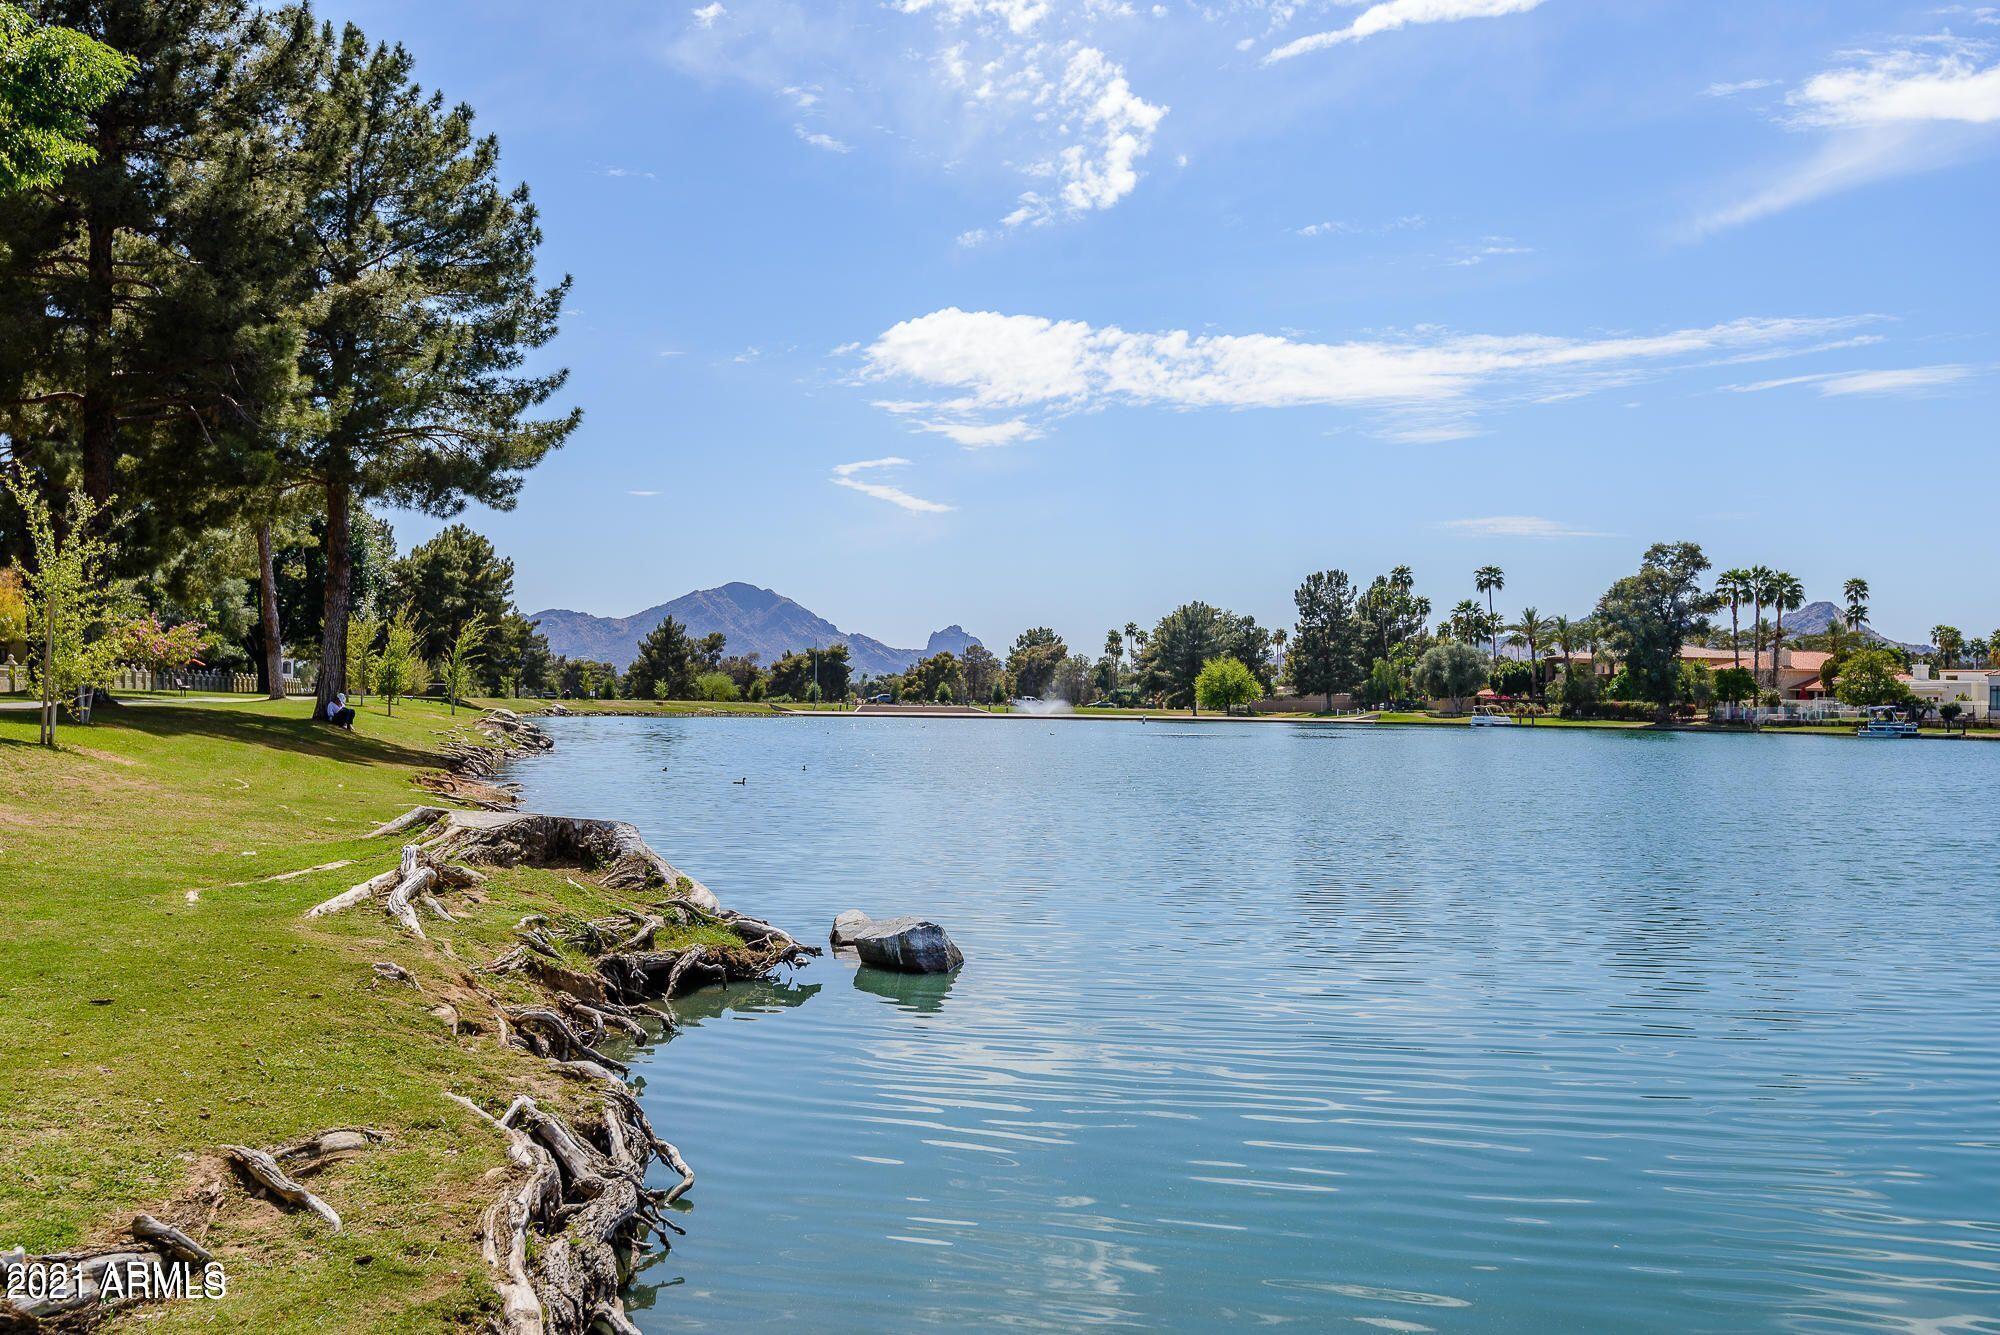 8270 N HAYDEN Road # 2005, Scottsdale, AZ 85258, 3 Bedrooms Bedrooms, ,Residential Lease,For Rent,8270 N HAYDEN Road # 2005,6305810